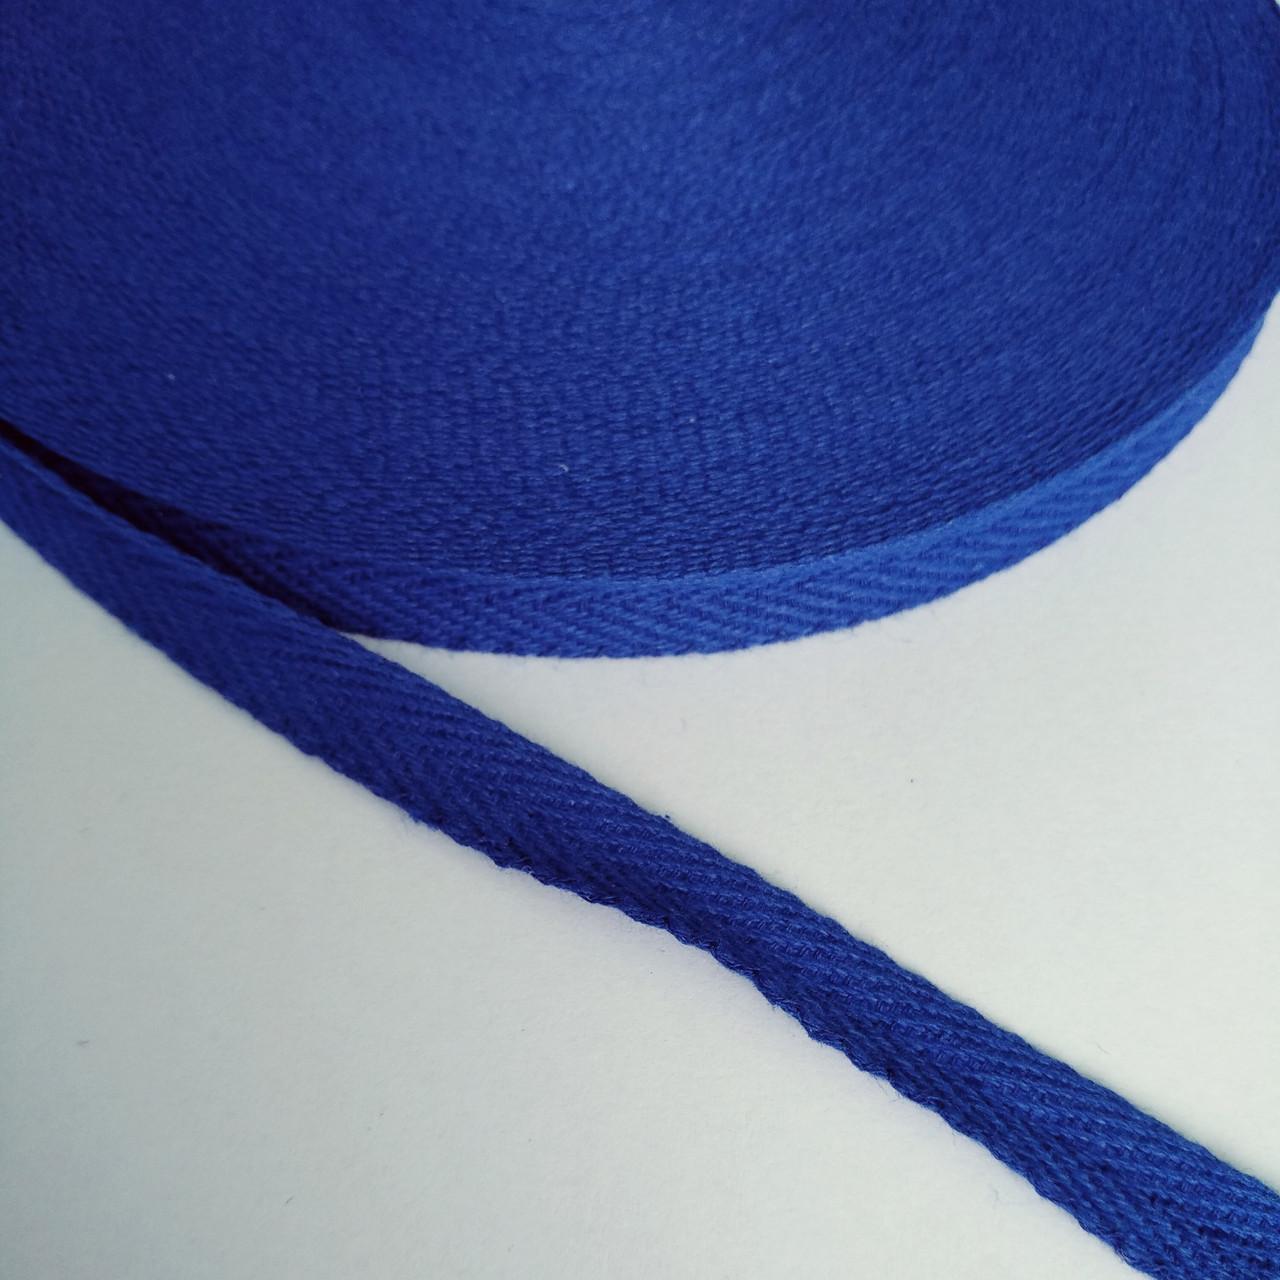 Киперная стрічка хб, 10 мм. синя.